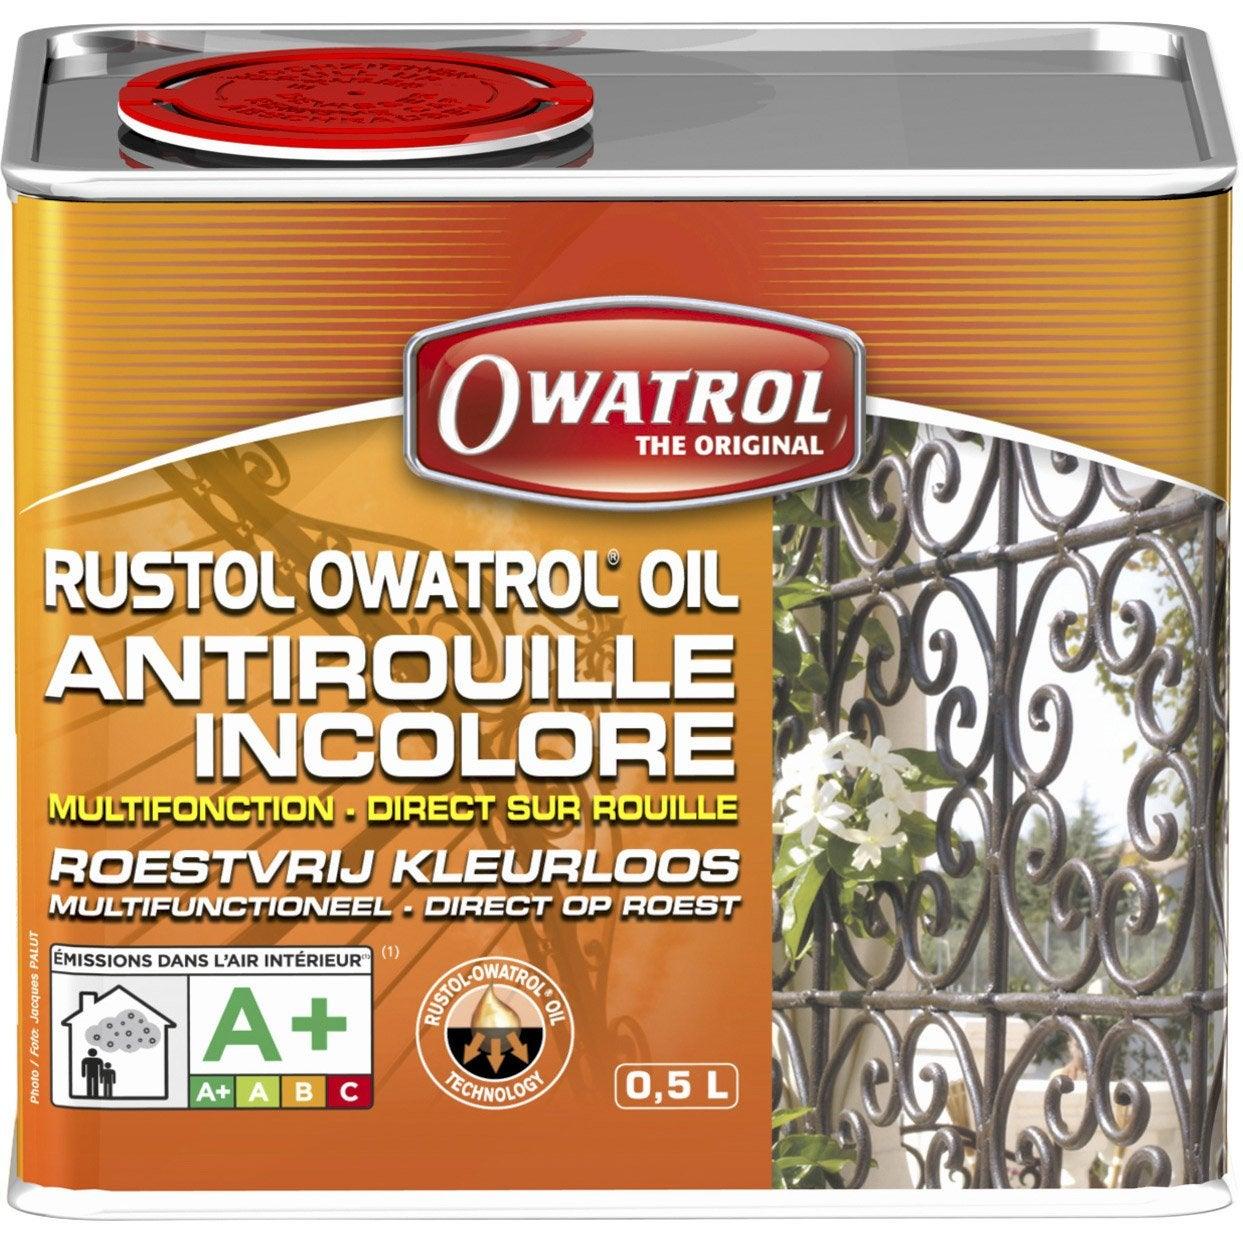 Protection antirouille ext rieur int rieur rustol owatrol incolore 0 5 l - Fer a beton leroy merlin ...